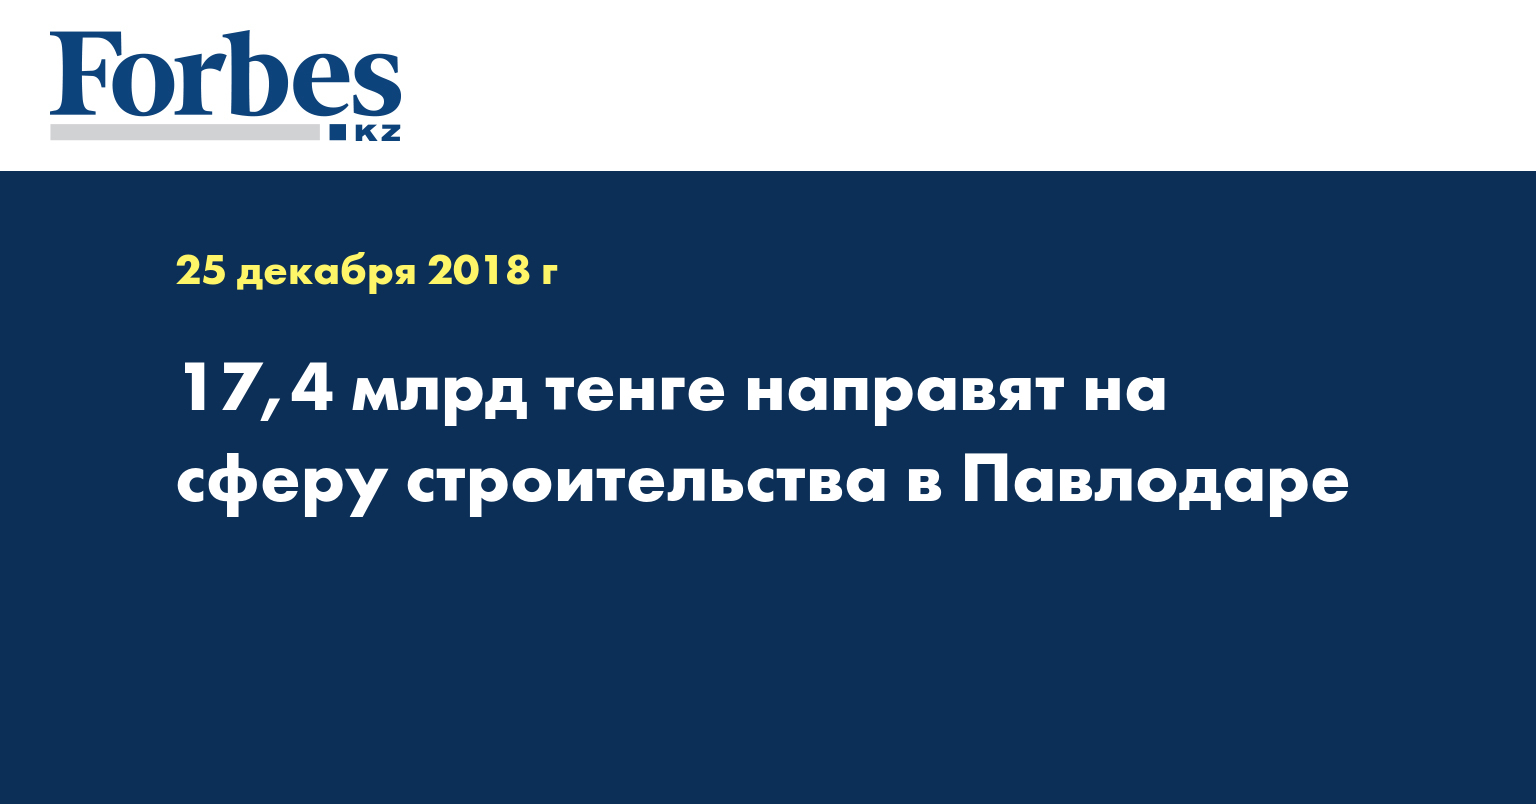 17,4 млрд тенге направят на сферу строительства в Павлодаре